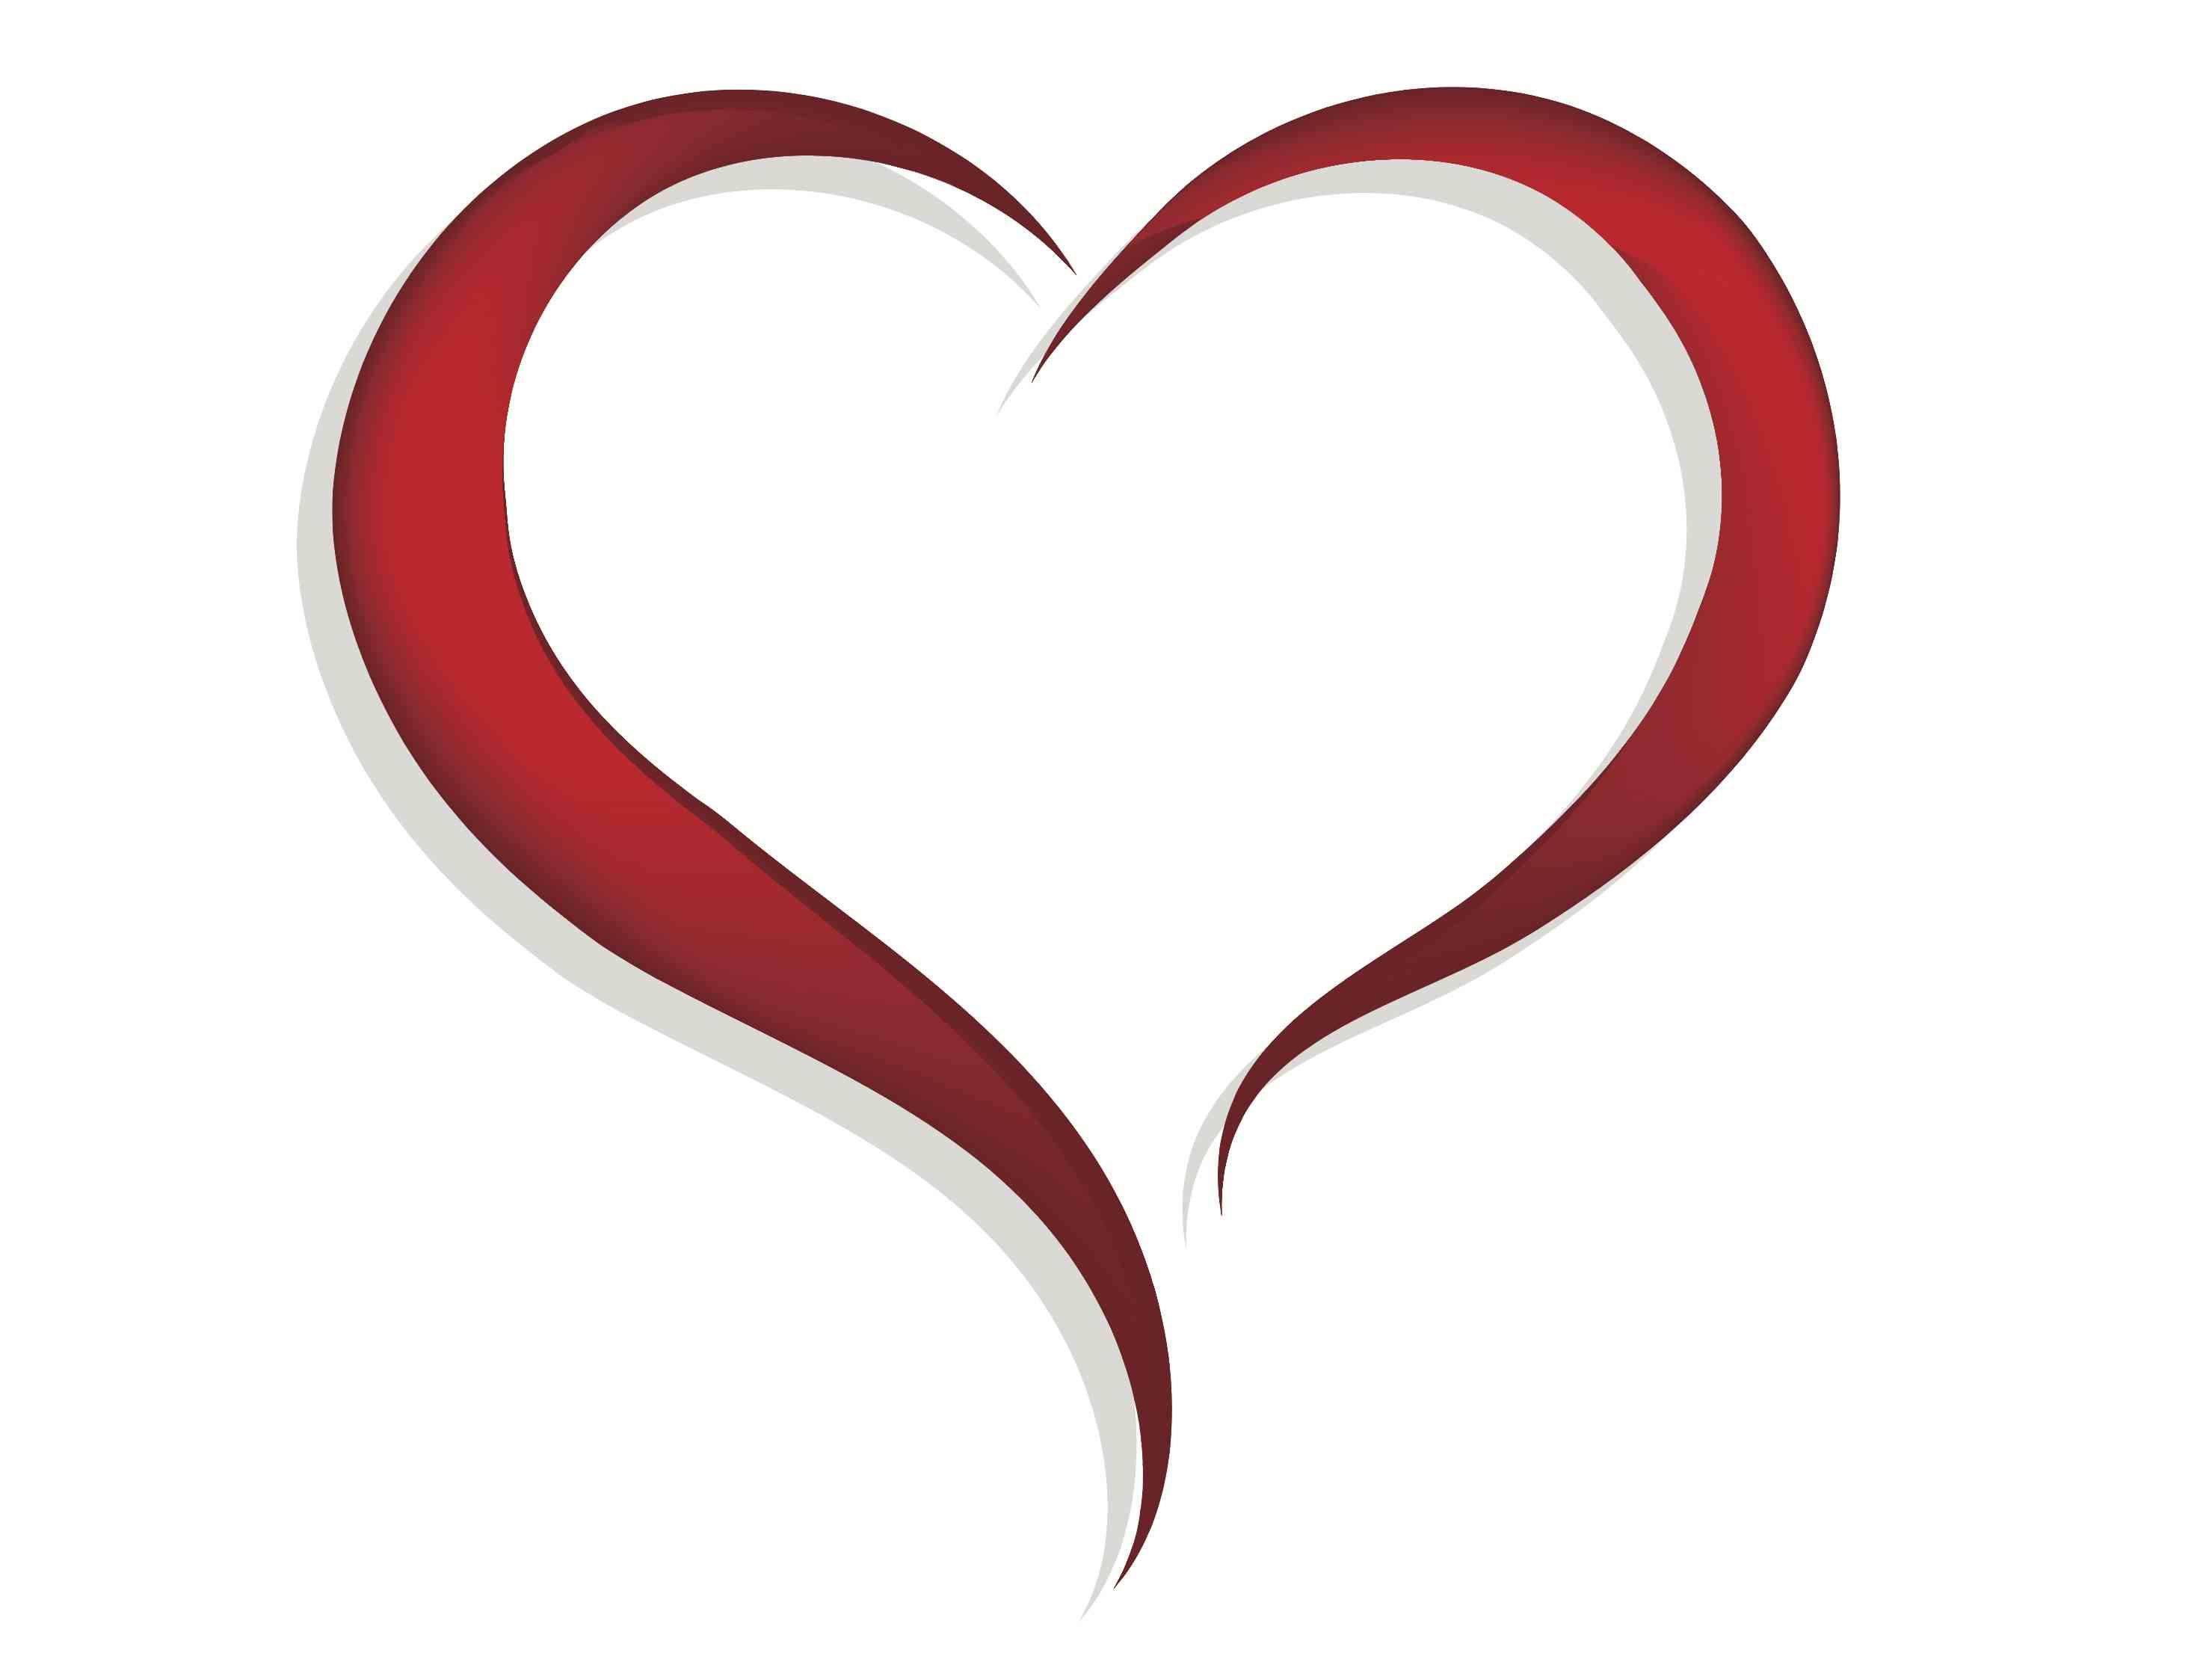 Fancy Heart Clip Art - ClipArt Best